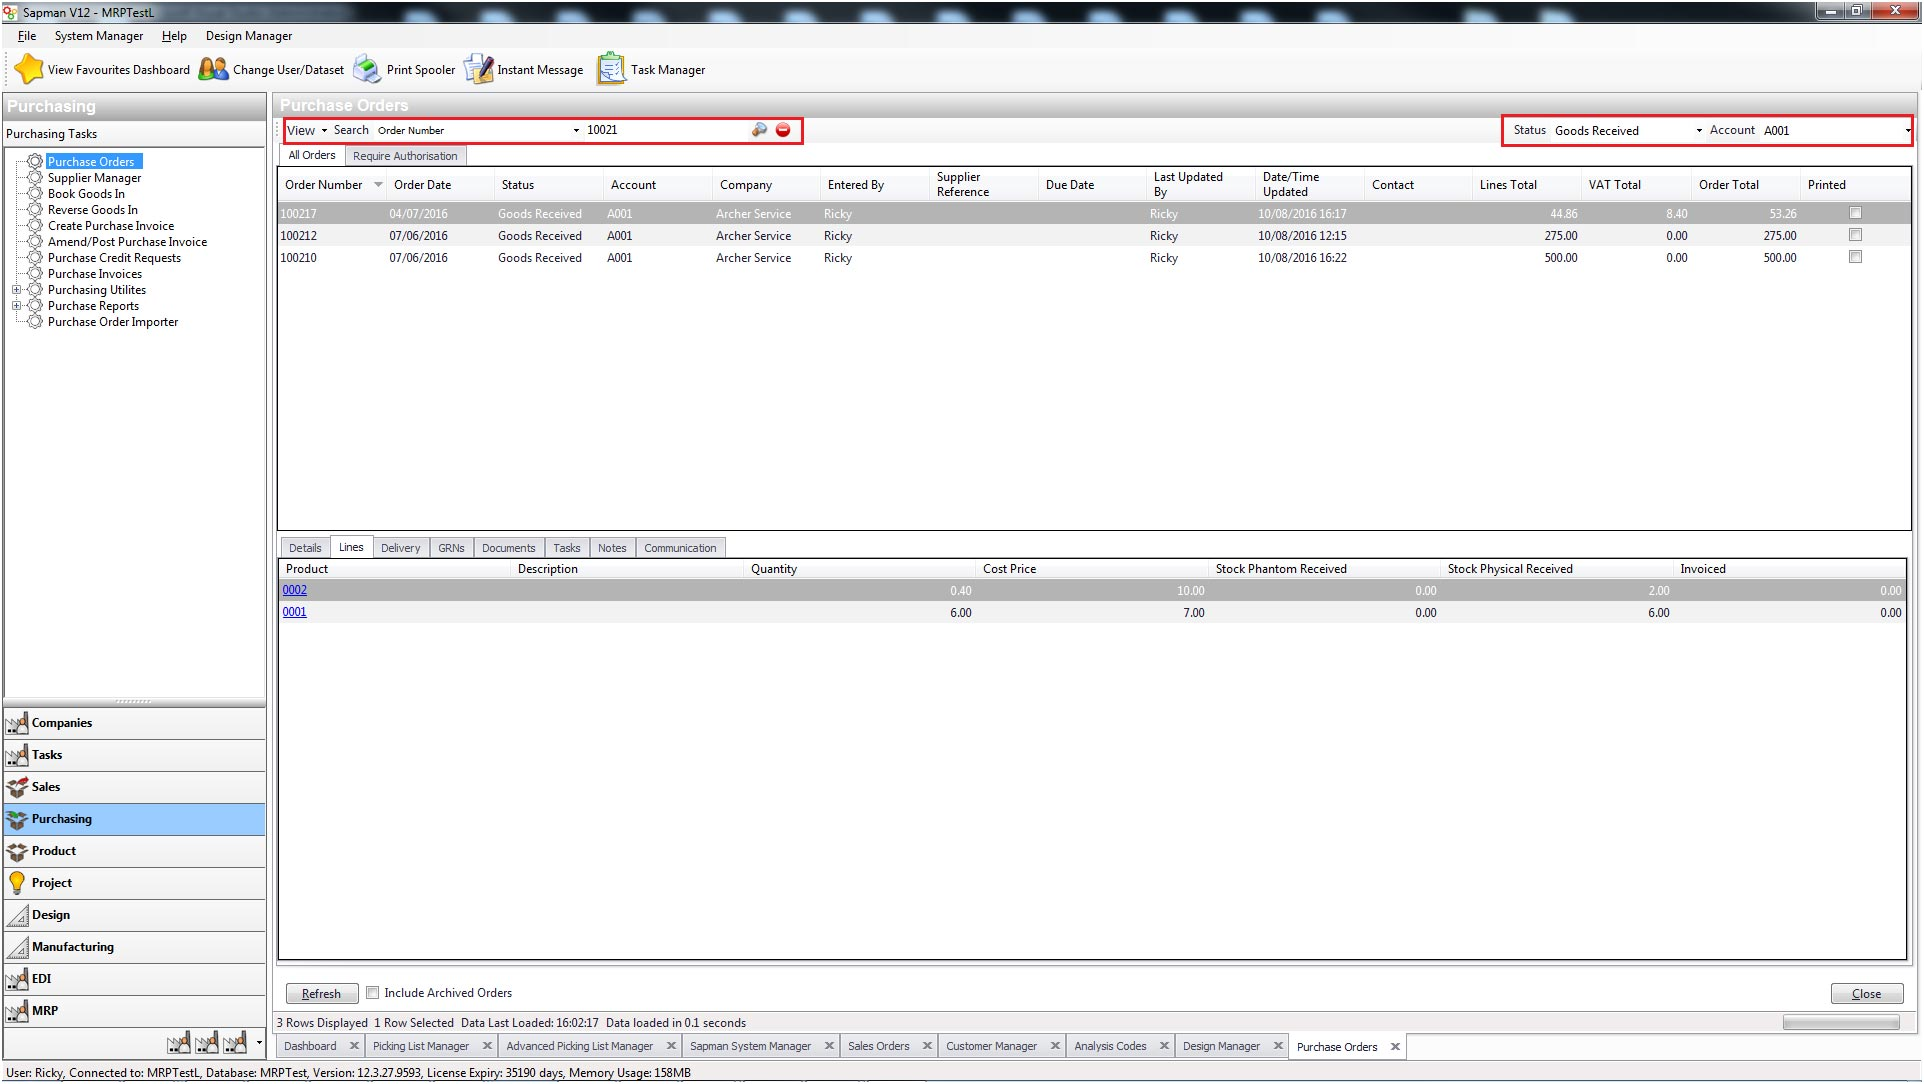 Sapman v12 Purchase Order Manager screen